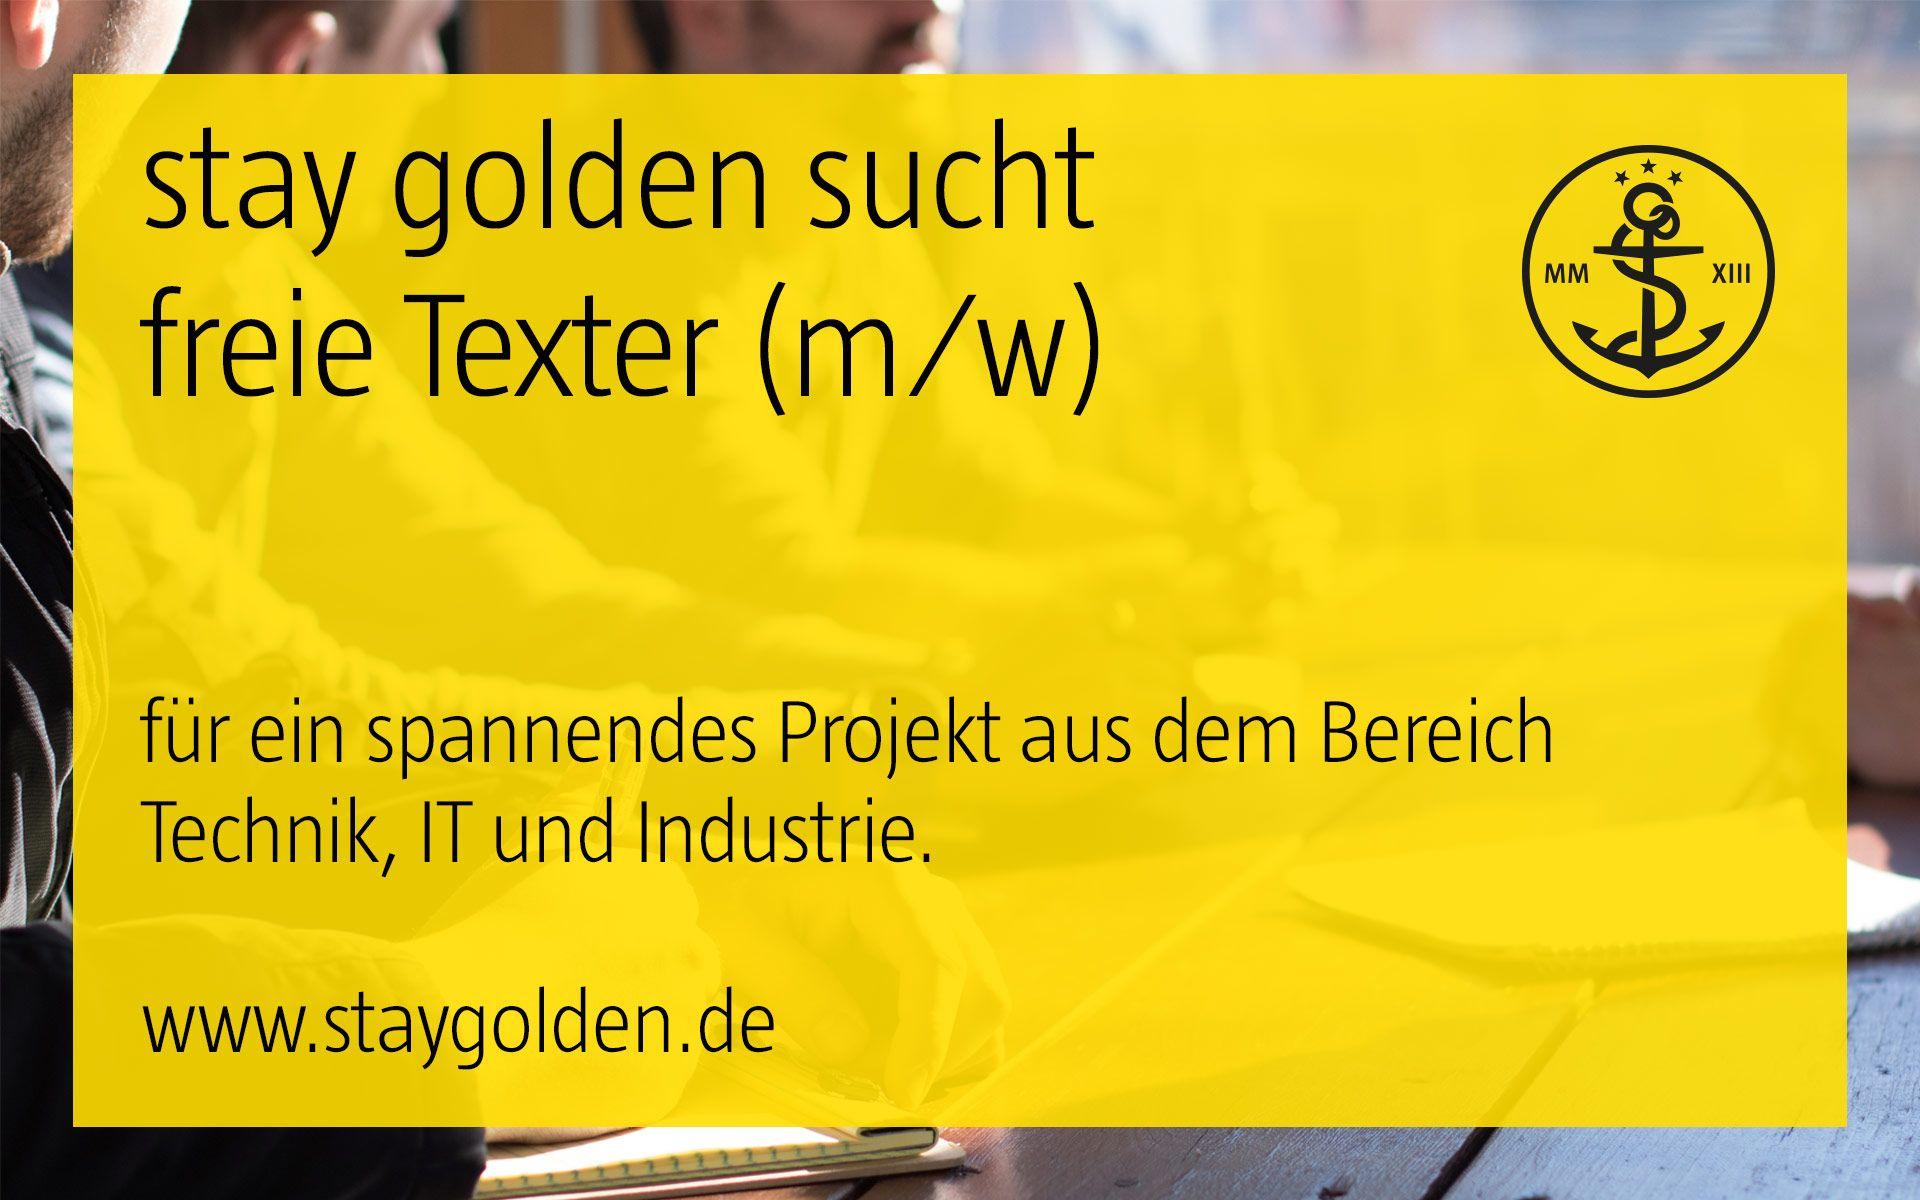 stay golden, aufruf, offene stelle, freelance, freelancing, texter, text, konzept, technologie